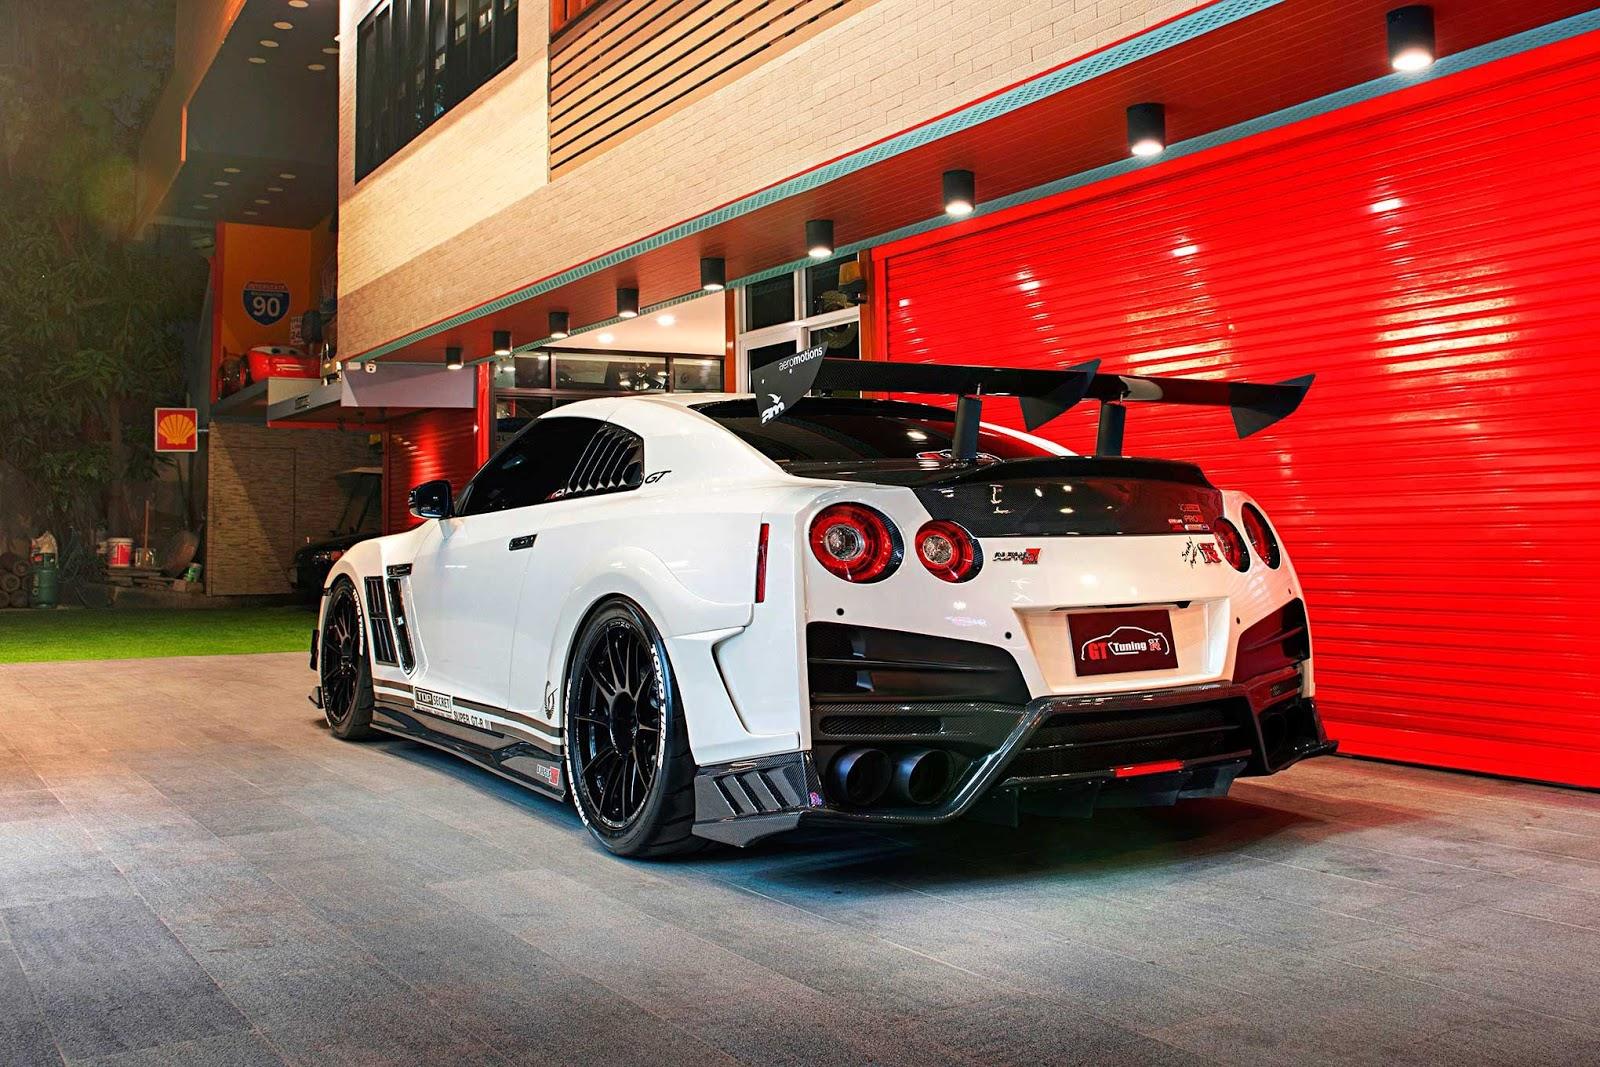 Nissan GT-R Monster Jalanan